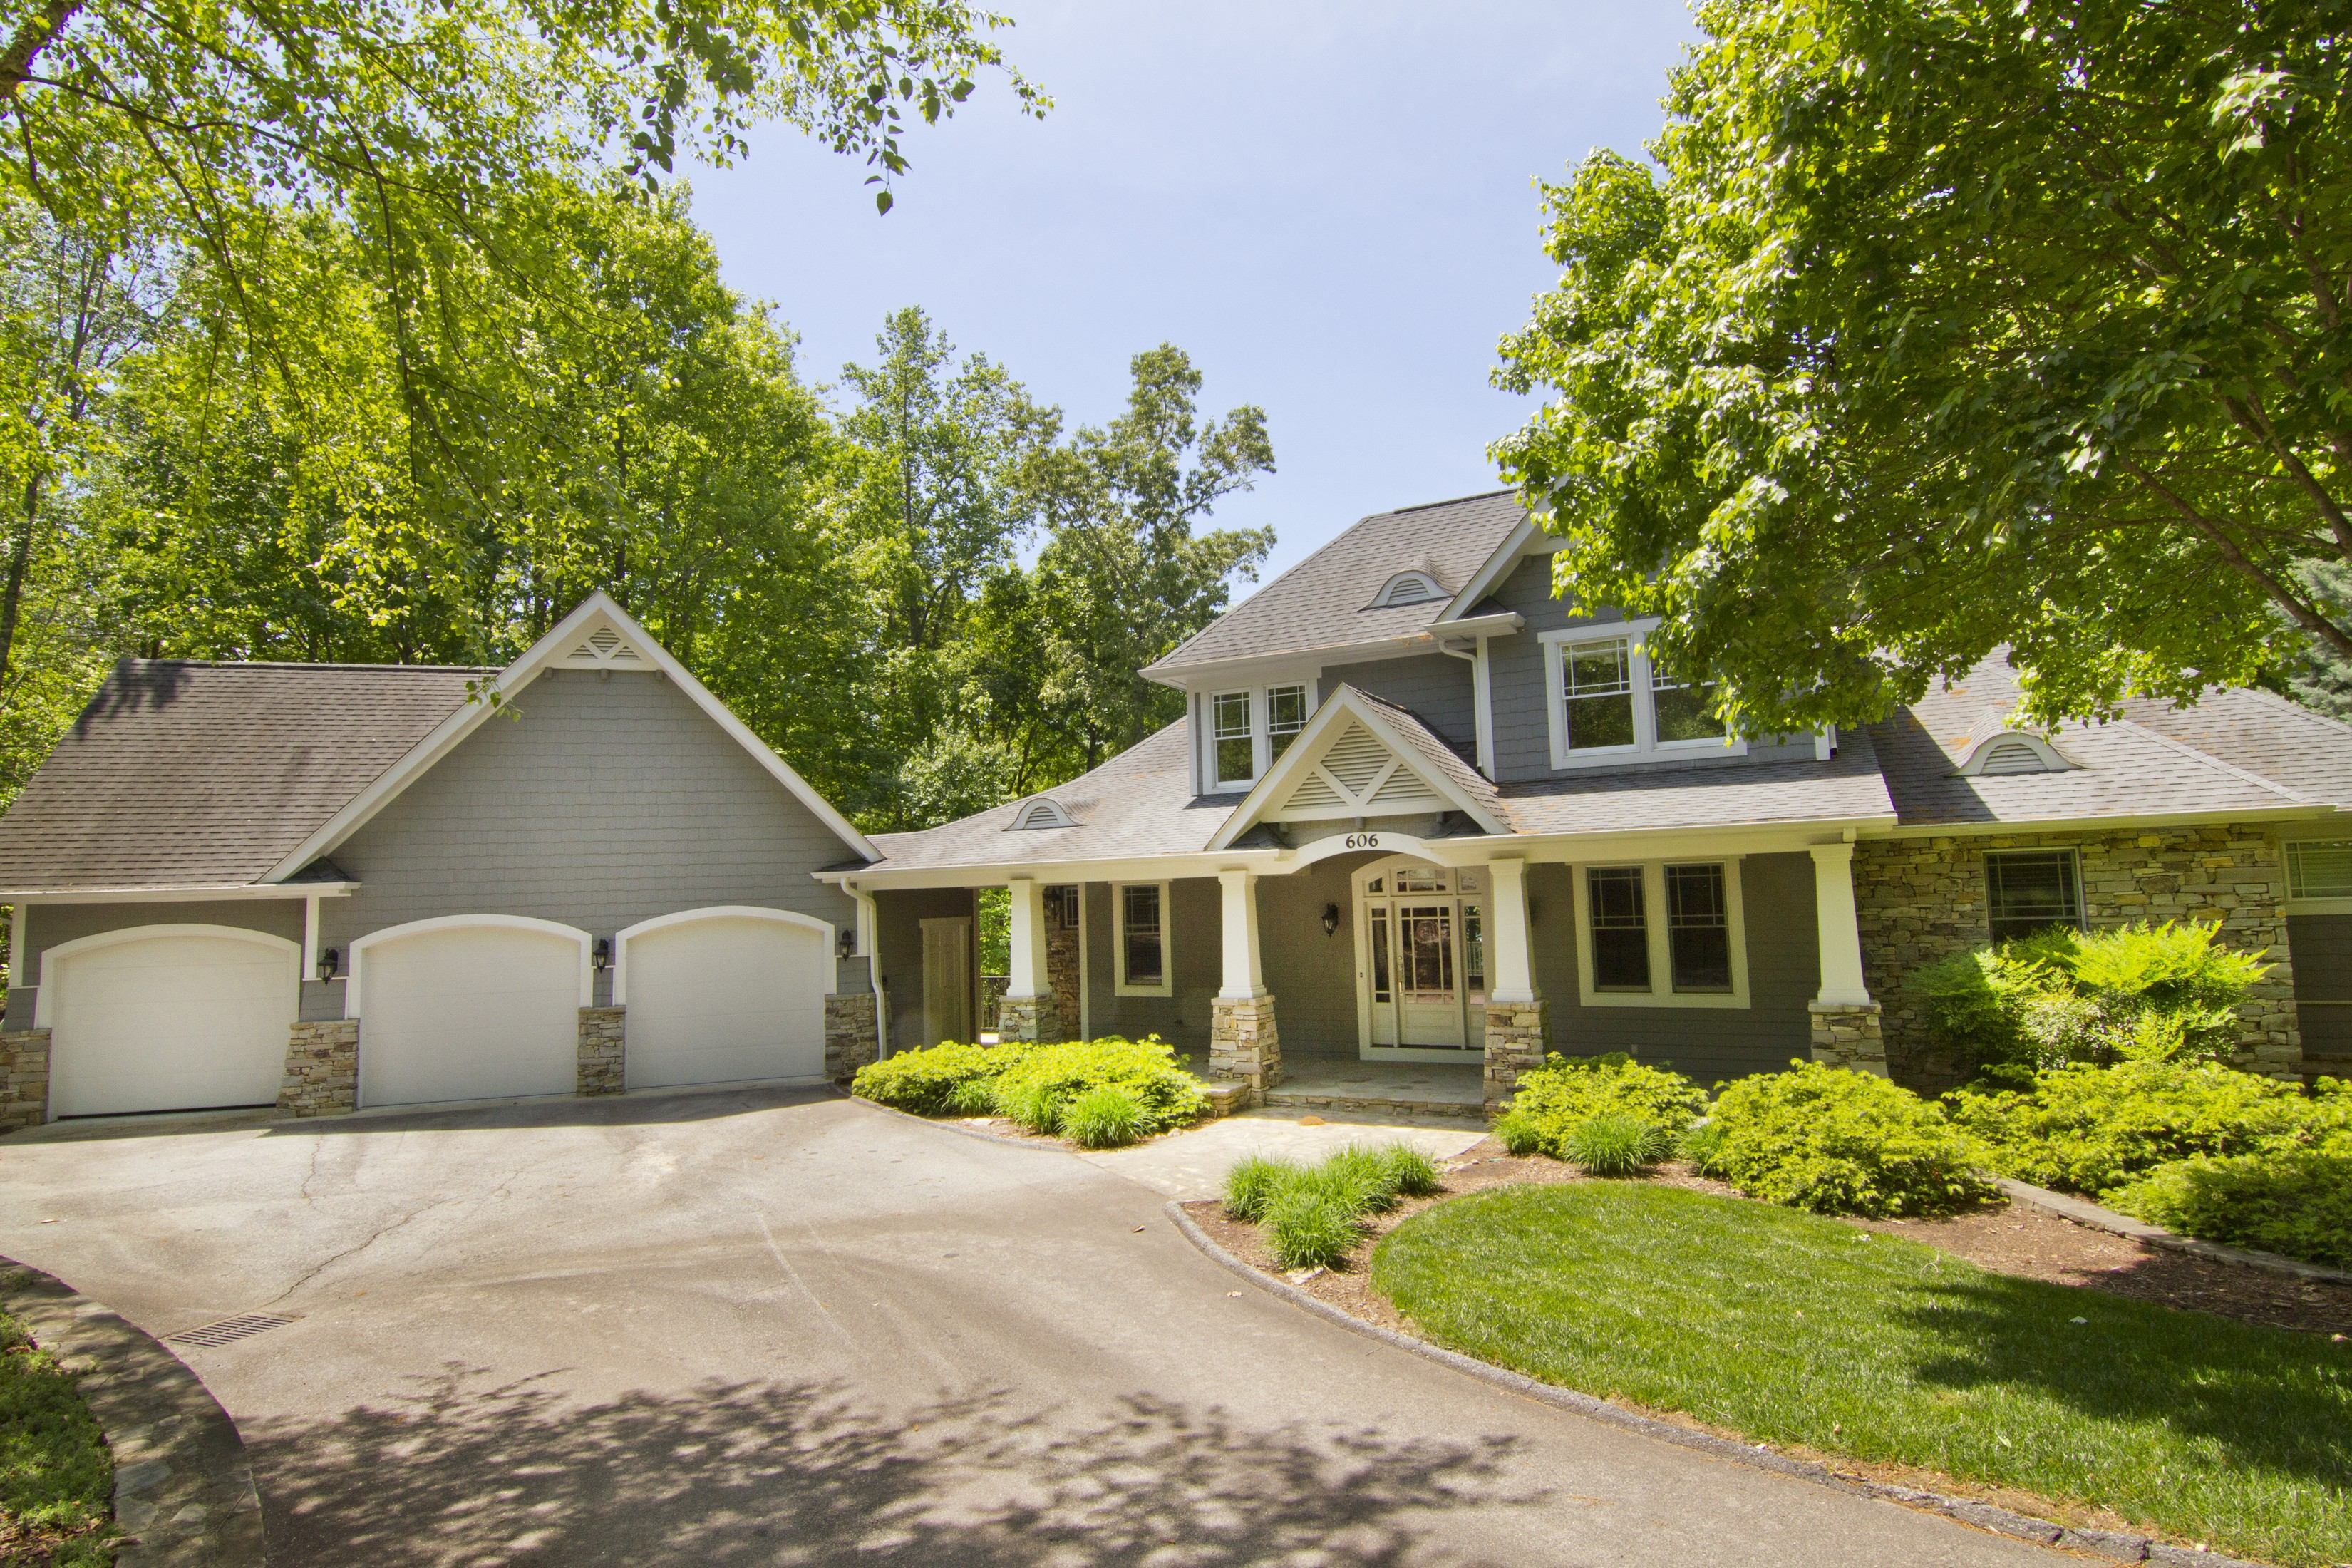 Villa per Vendita alle ore Three Story Waterfront Home with Beautiful Western Lake Views 606 Wind Flower Drive Sunset, Carolina Del Sud, 29685 Stati Uniti